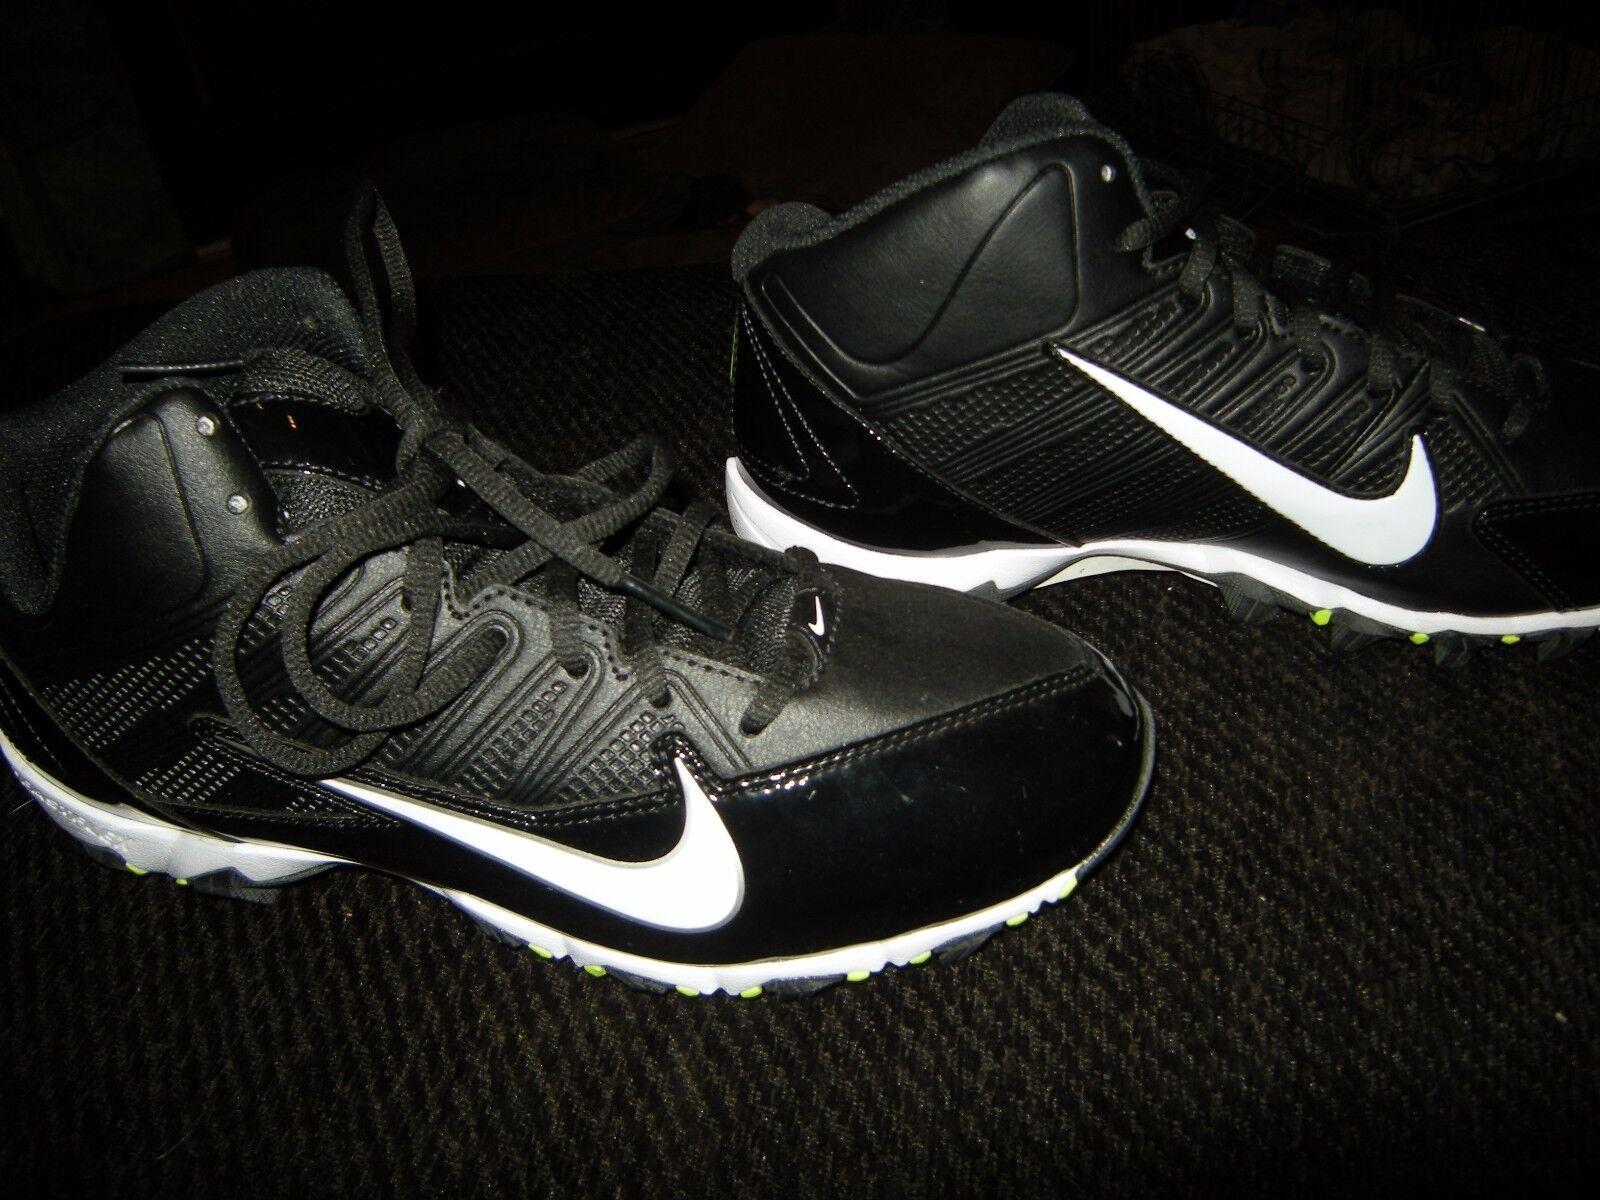 innovative design 3bcdb a7996 Brand New Hombre Negro Negro Negro   Amarillo Nike Alpha Pro 3   4 d  Football cleats, comodo precio de temporada corta, beneficios de descuentos  3062fe